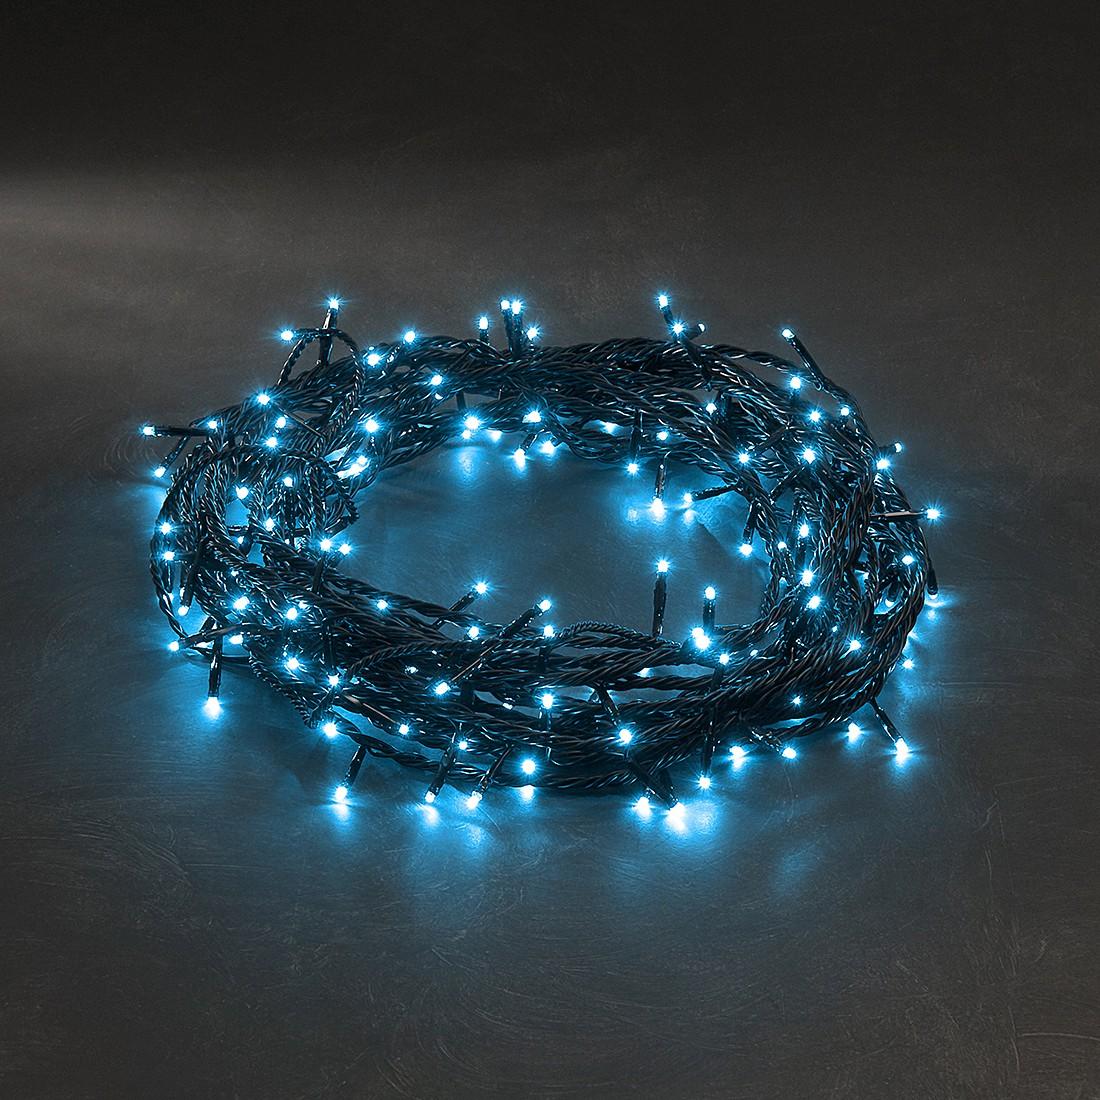 EEK A+, Micro LED Lichterkette - 40 hell blaue Dioden - Außen, Konstsmide